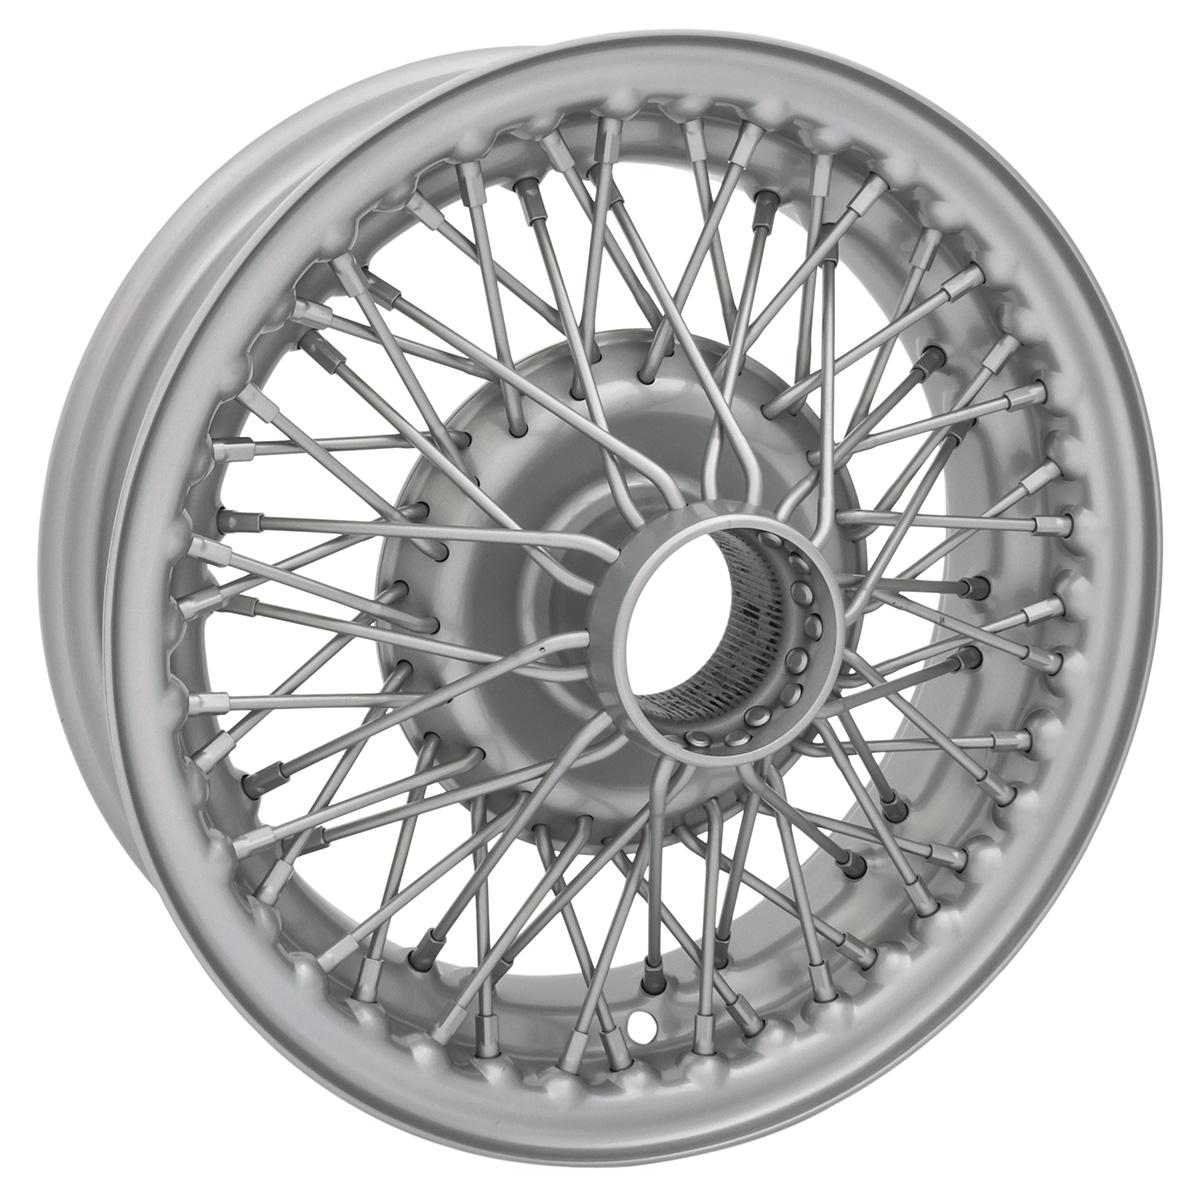 MG Midget Chrome Wire Wheel 6O Tubeless 13 x 4 Austin Healey Sprite